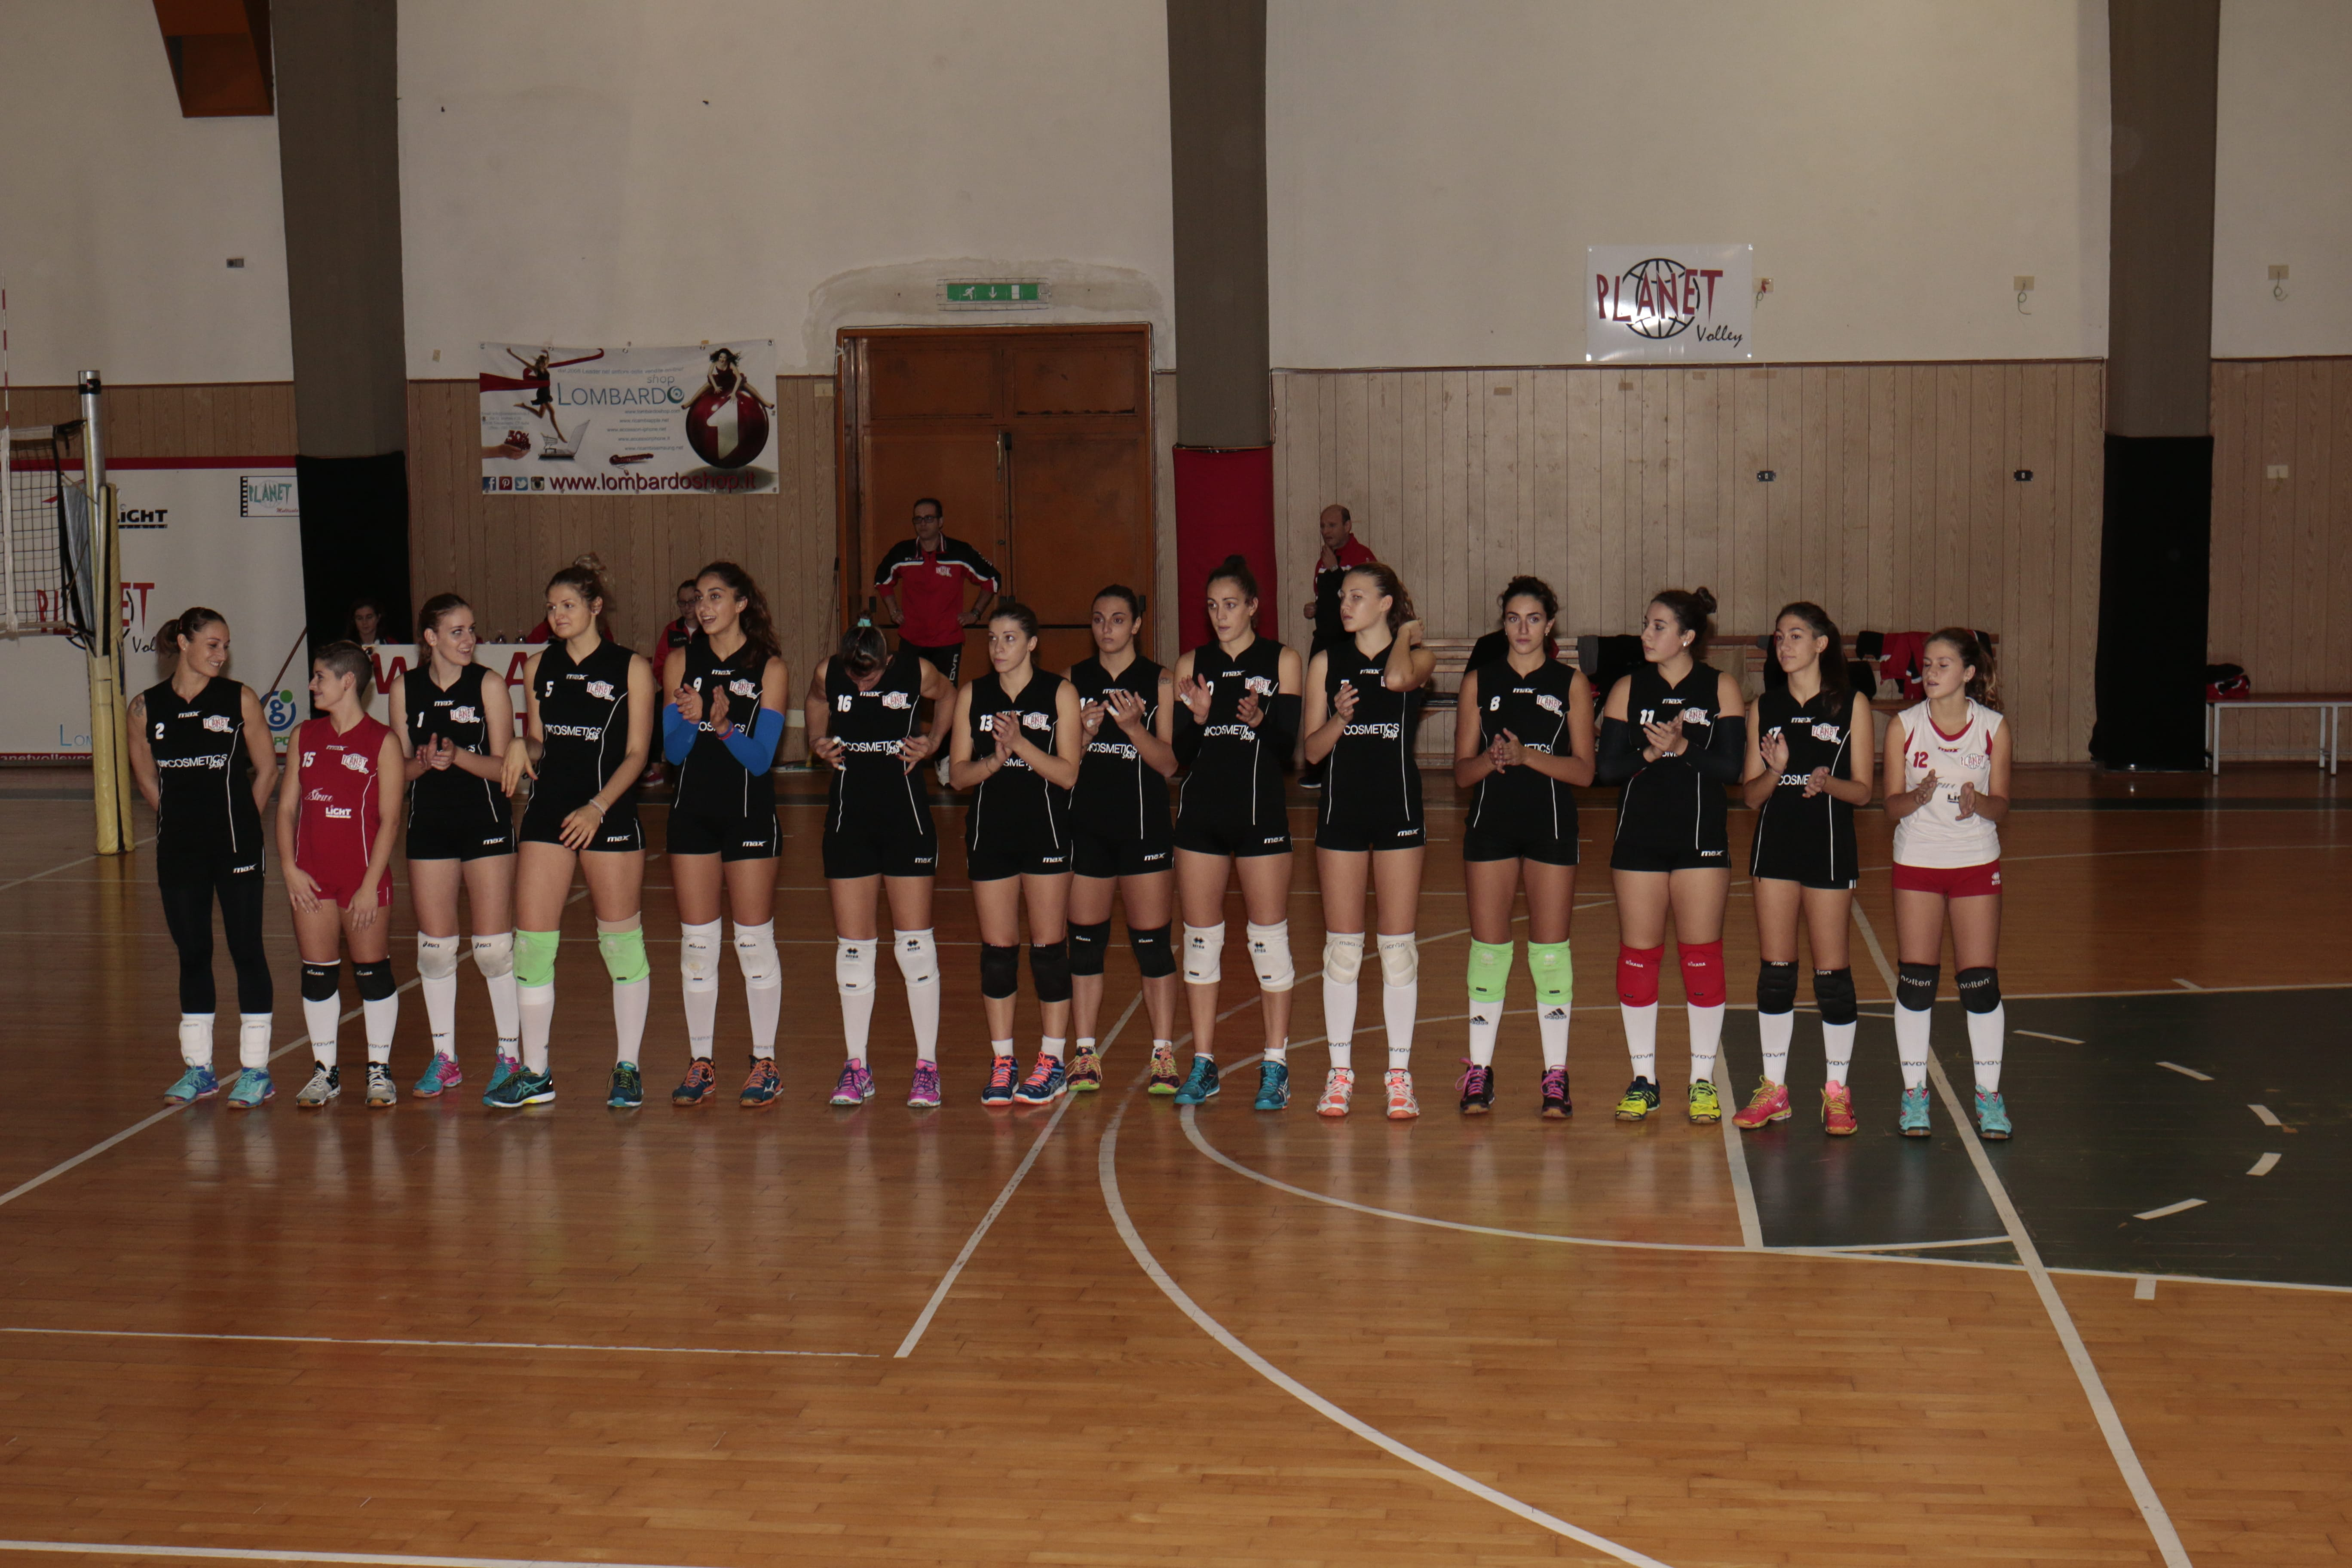 Squadra Planet Volley - OP e lo sport